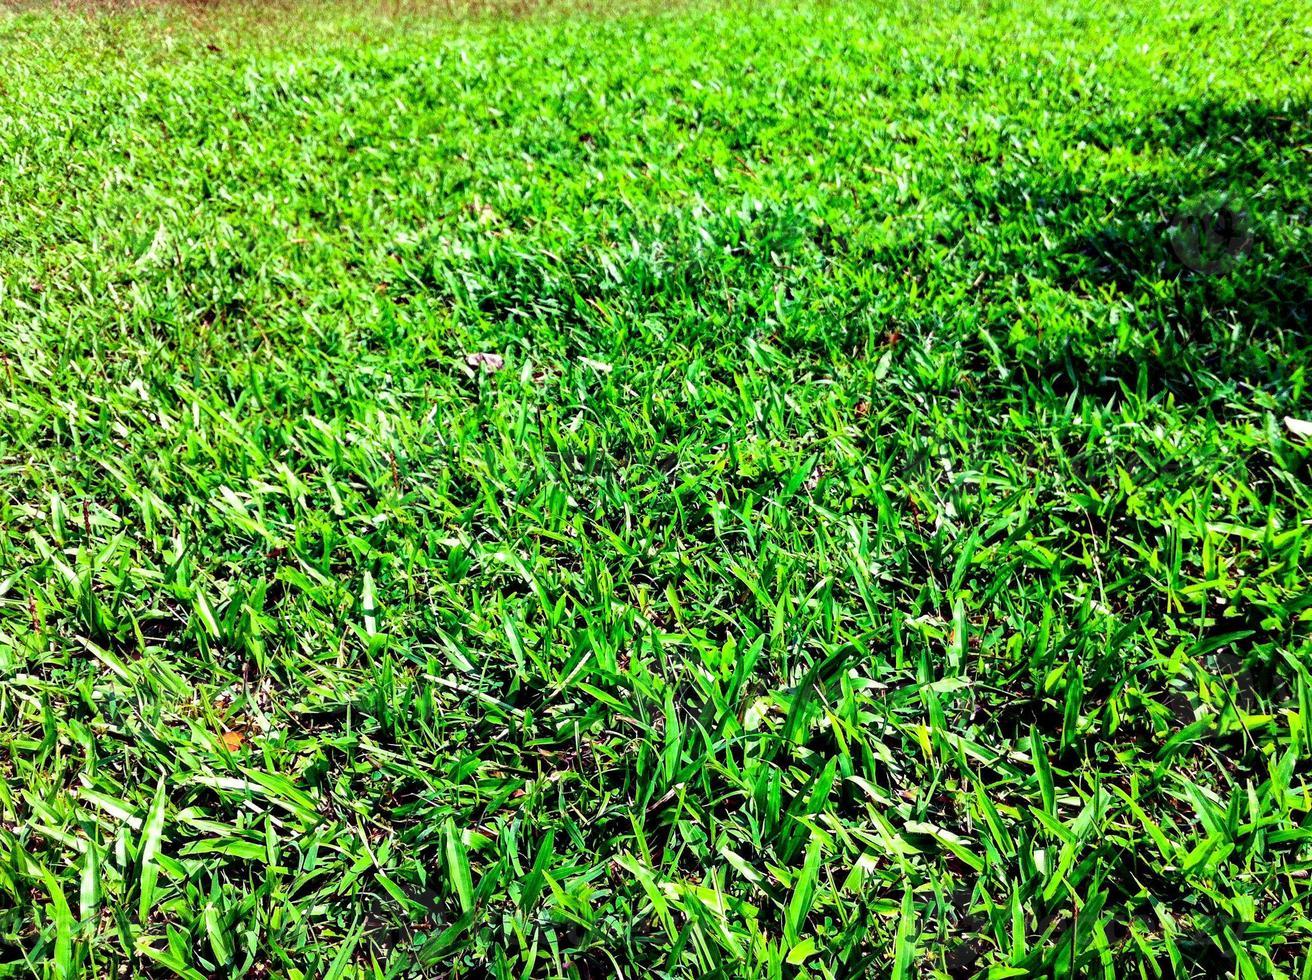 gramado verde lindo jardim foto